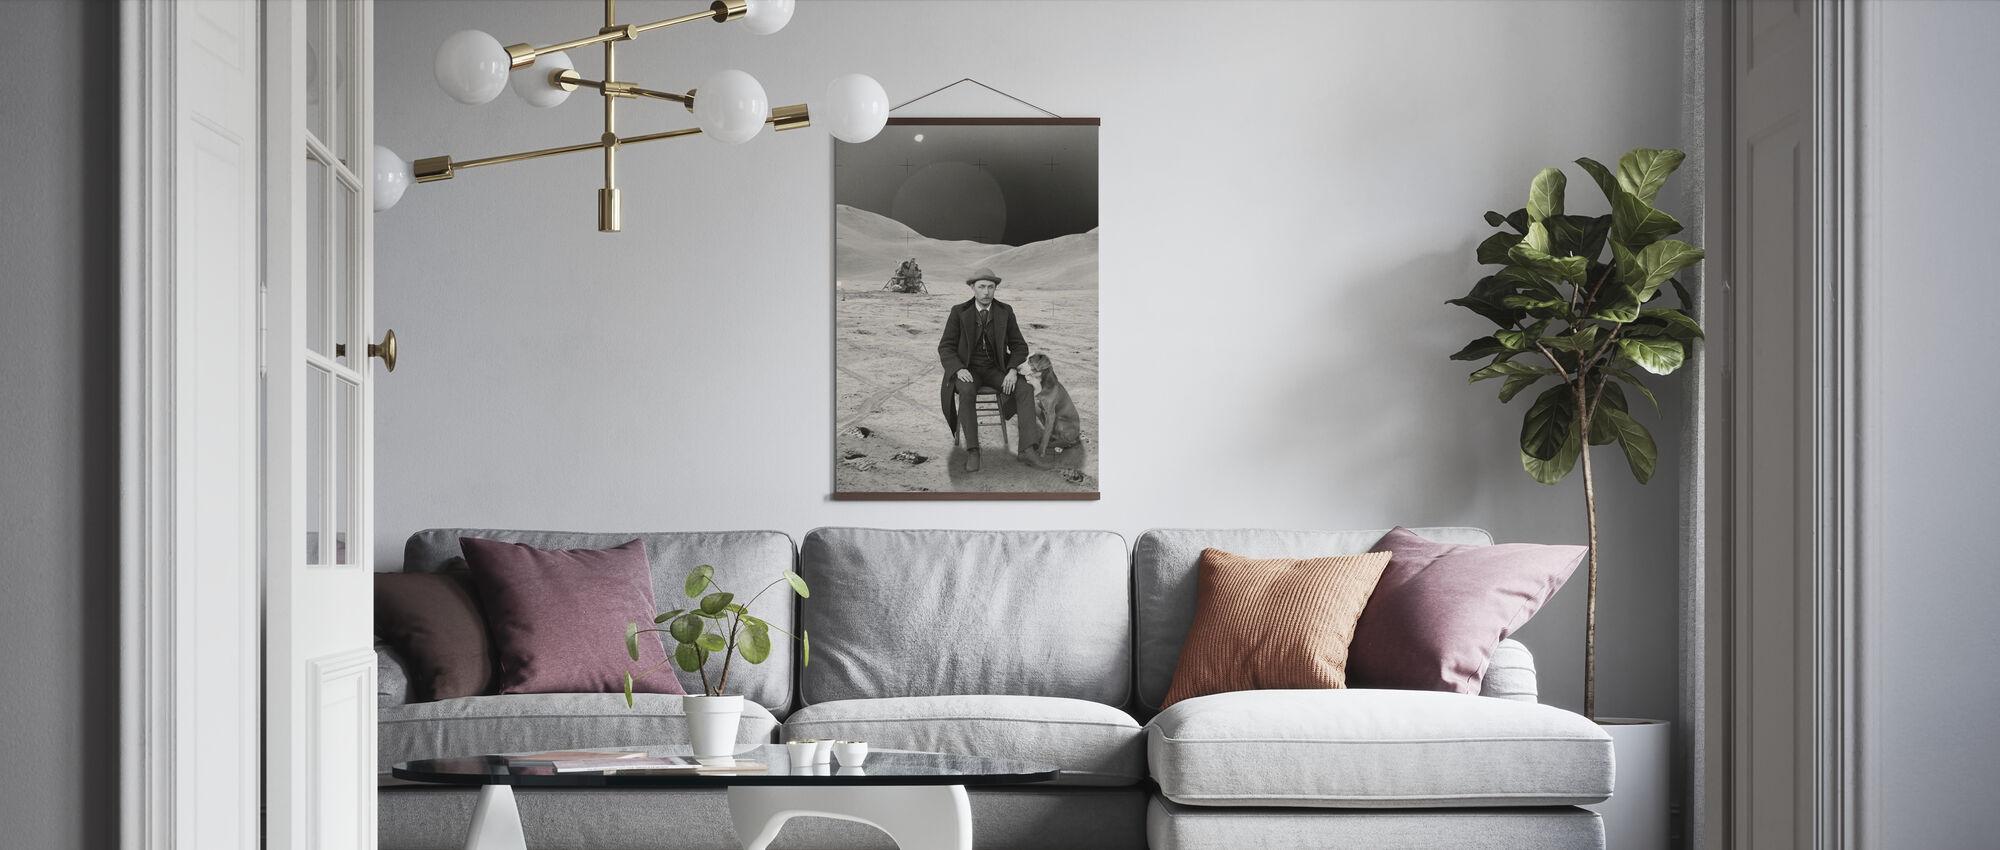 Moon Man - Poster - Living Room